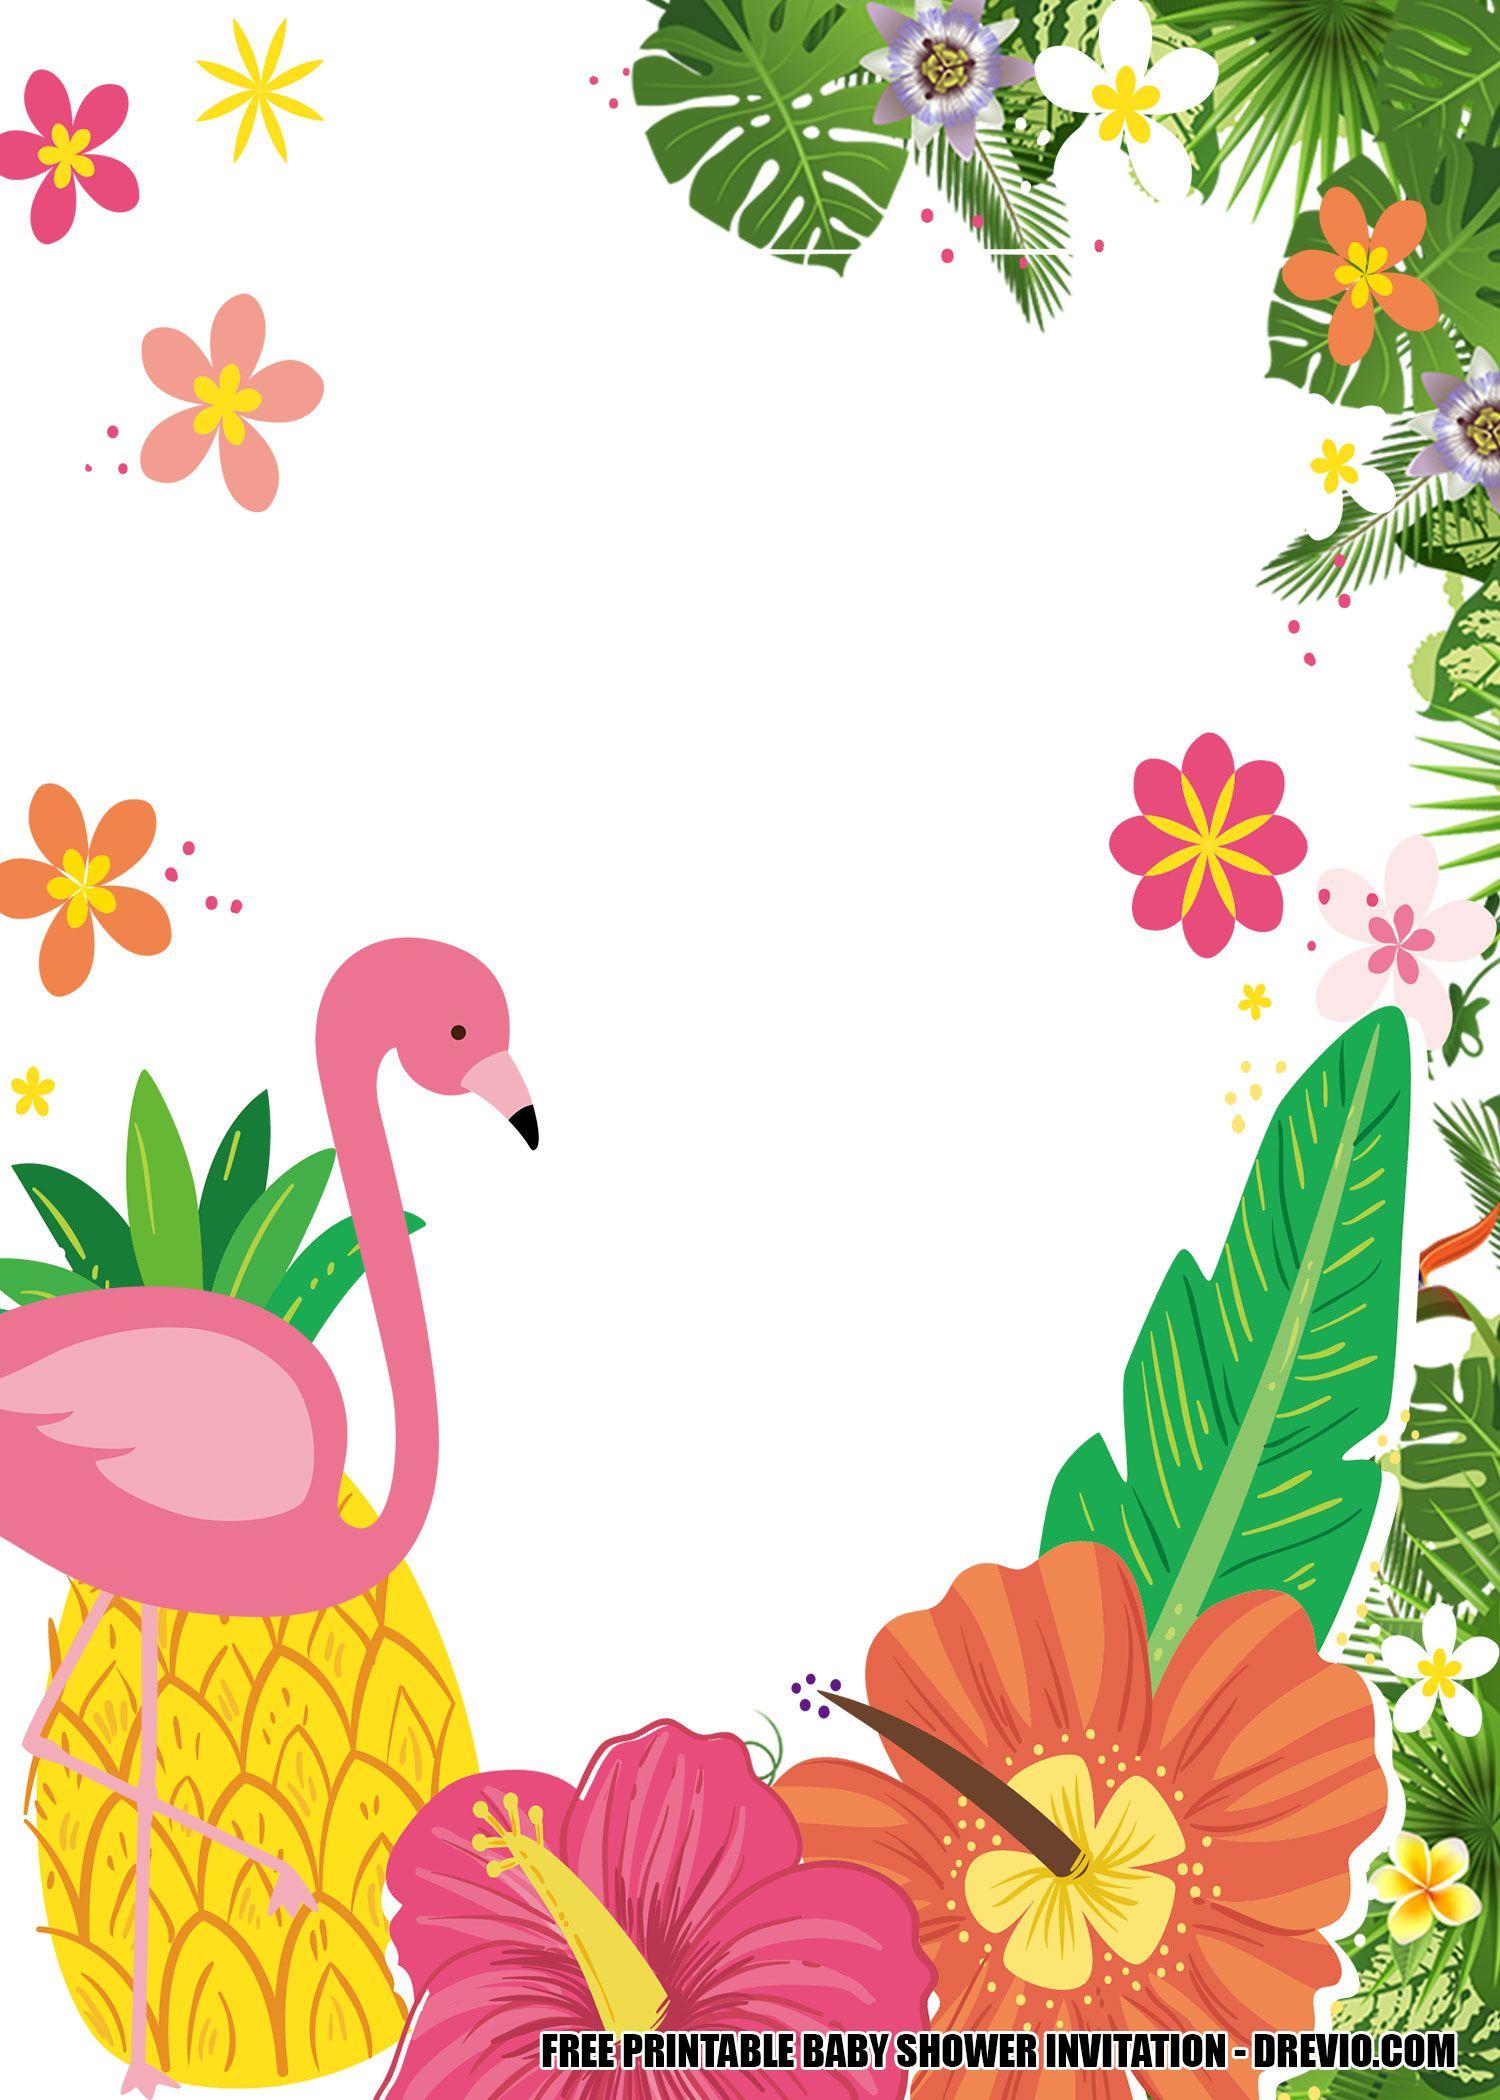 16 Free Flamingo Invitations Templates Downloadable For Any Occasions Flamingo Invitation Free Printable Baby Shower Invitations Printable Baby Shower Invitations